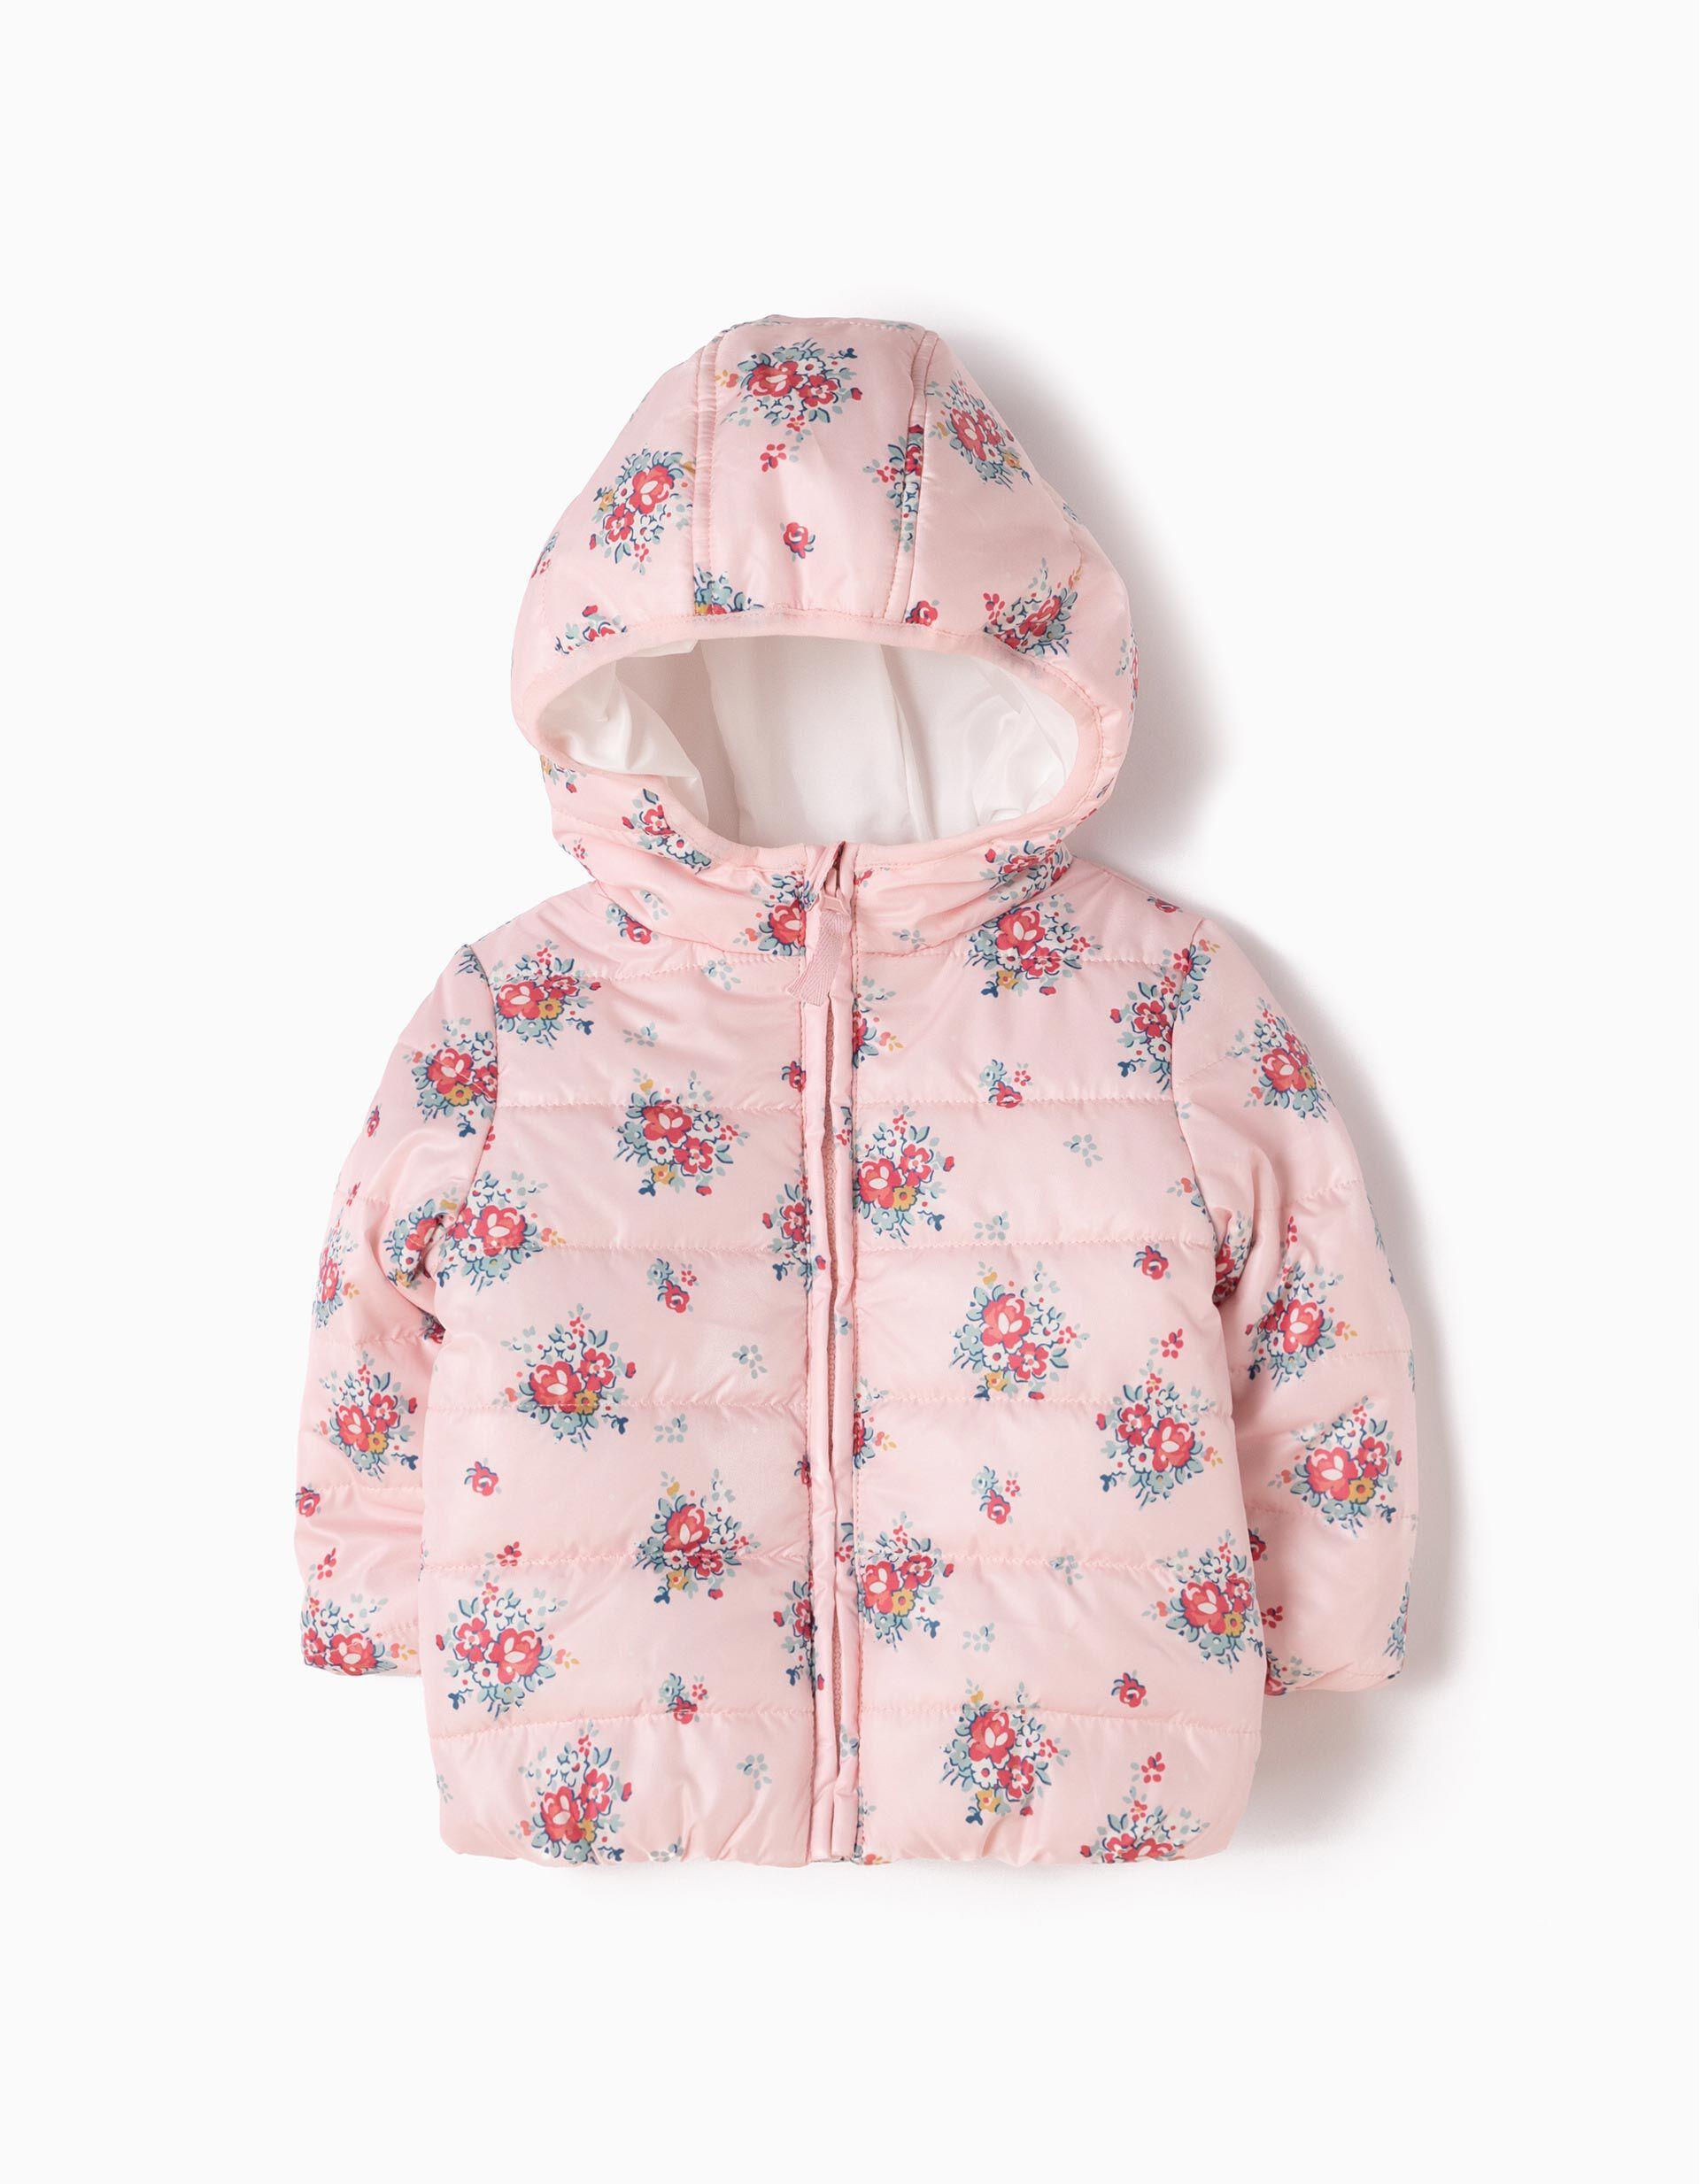 Bebé Menina Roupa para Bebé Menina | MO Online